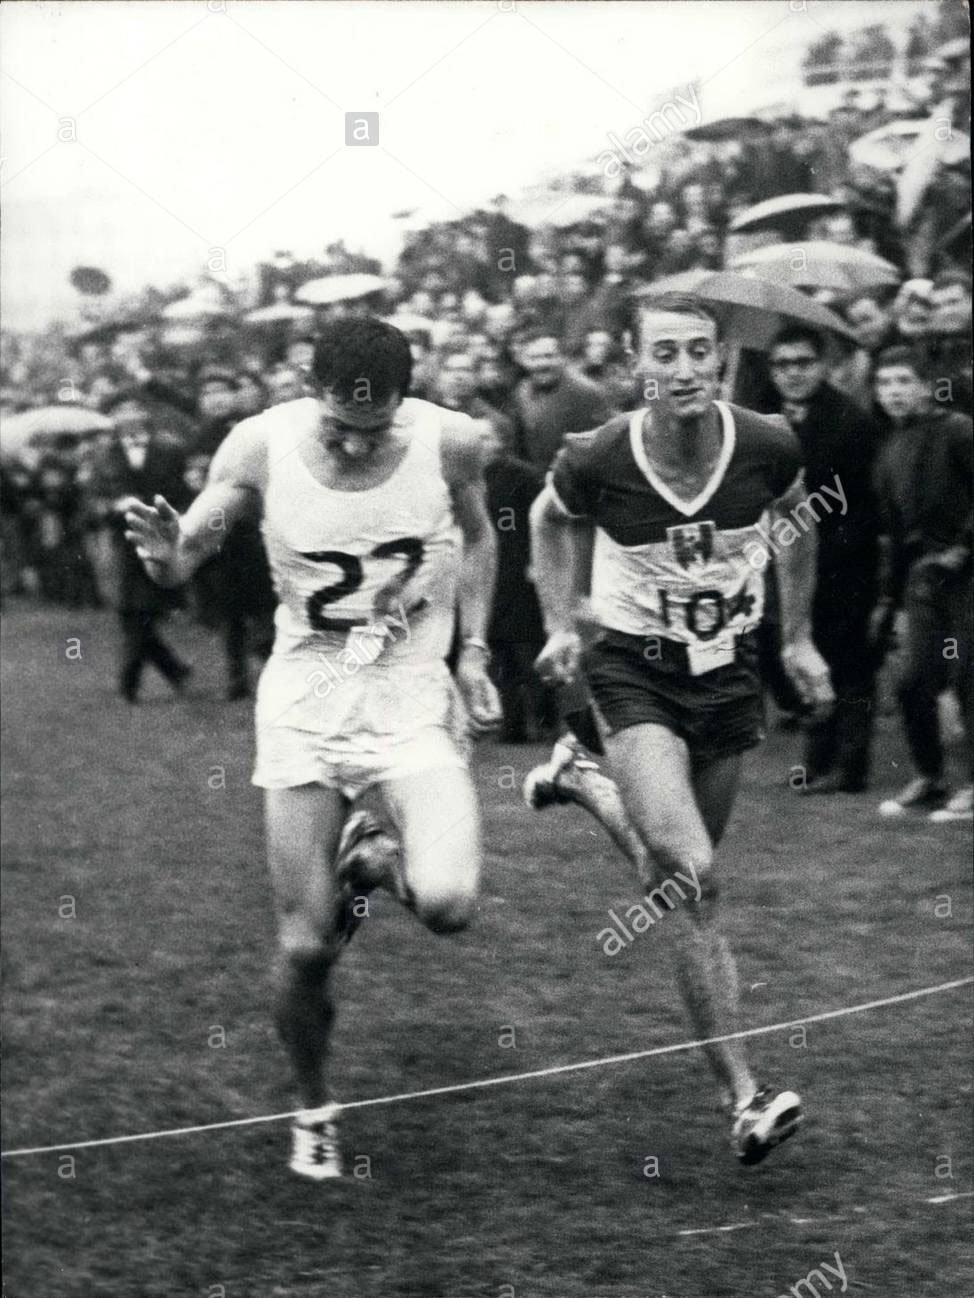 Jean Fayolle